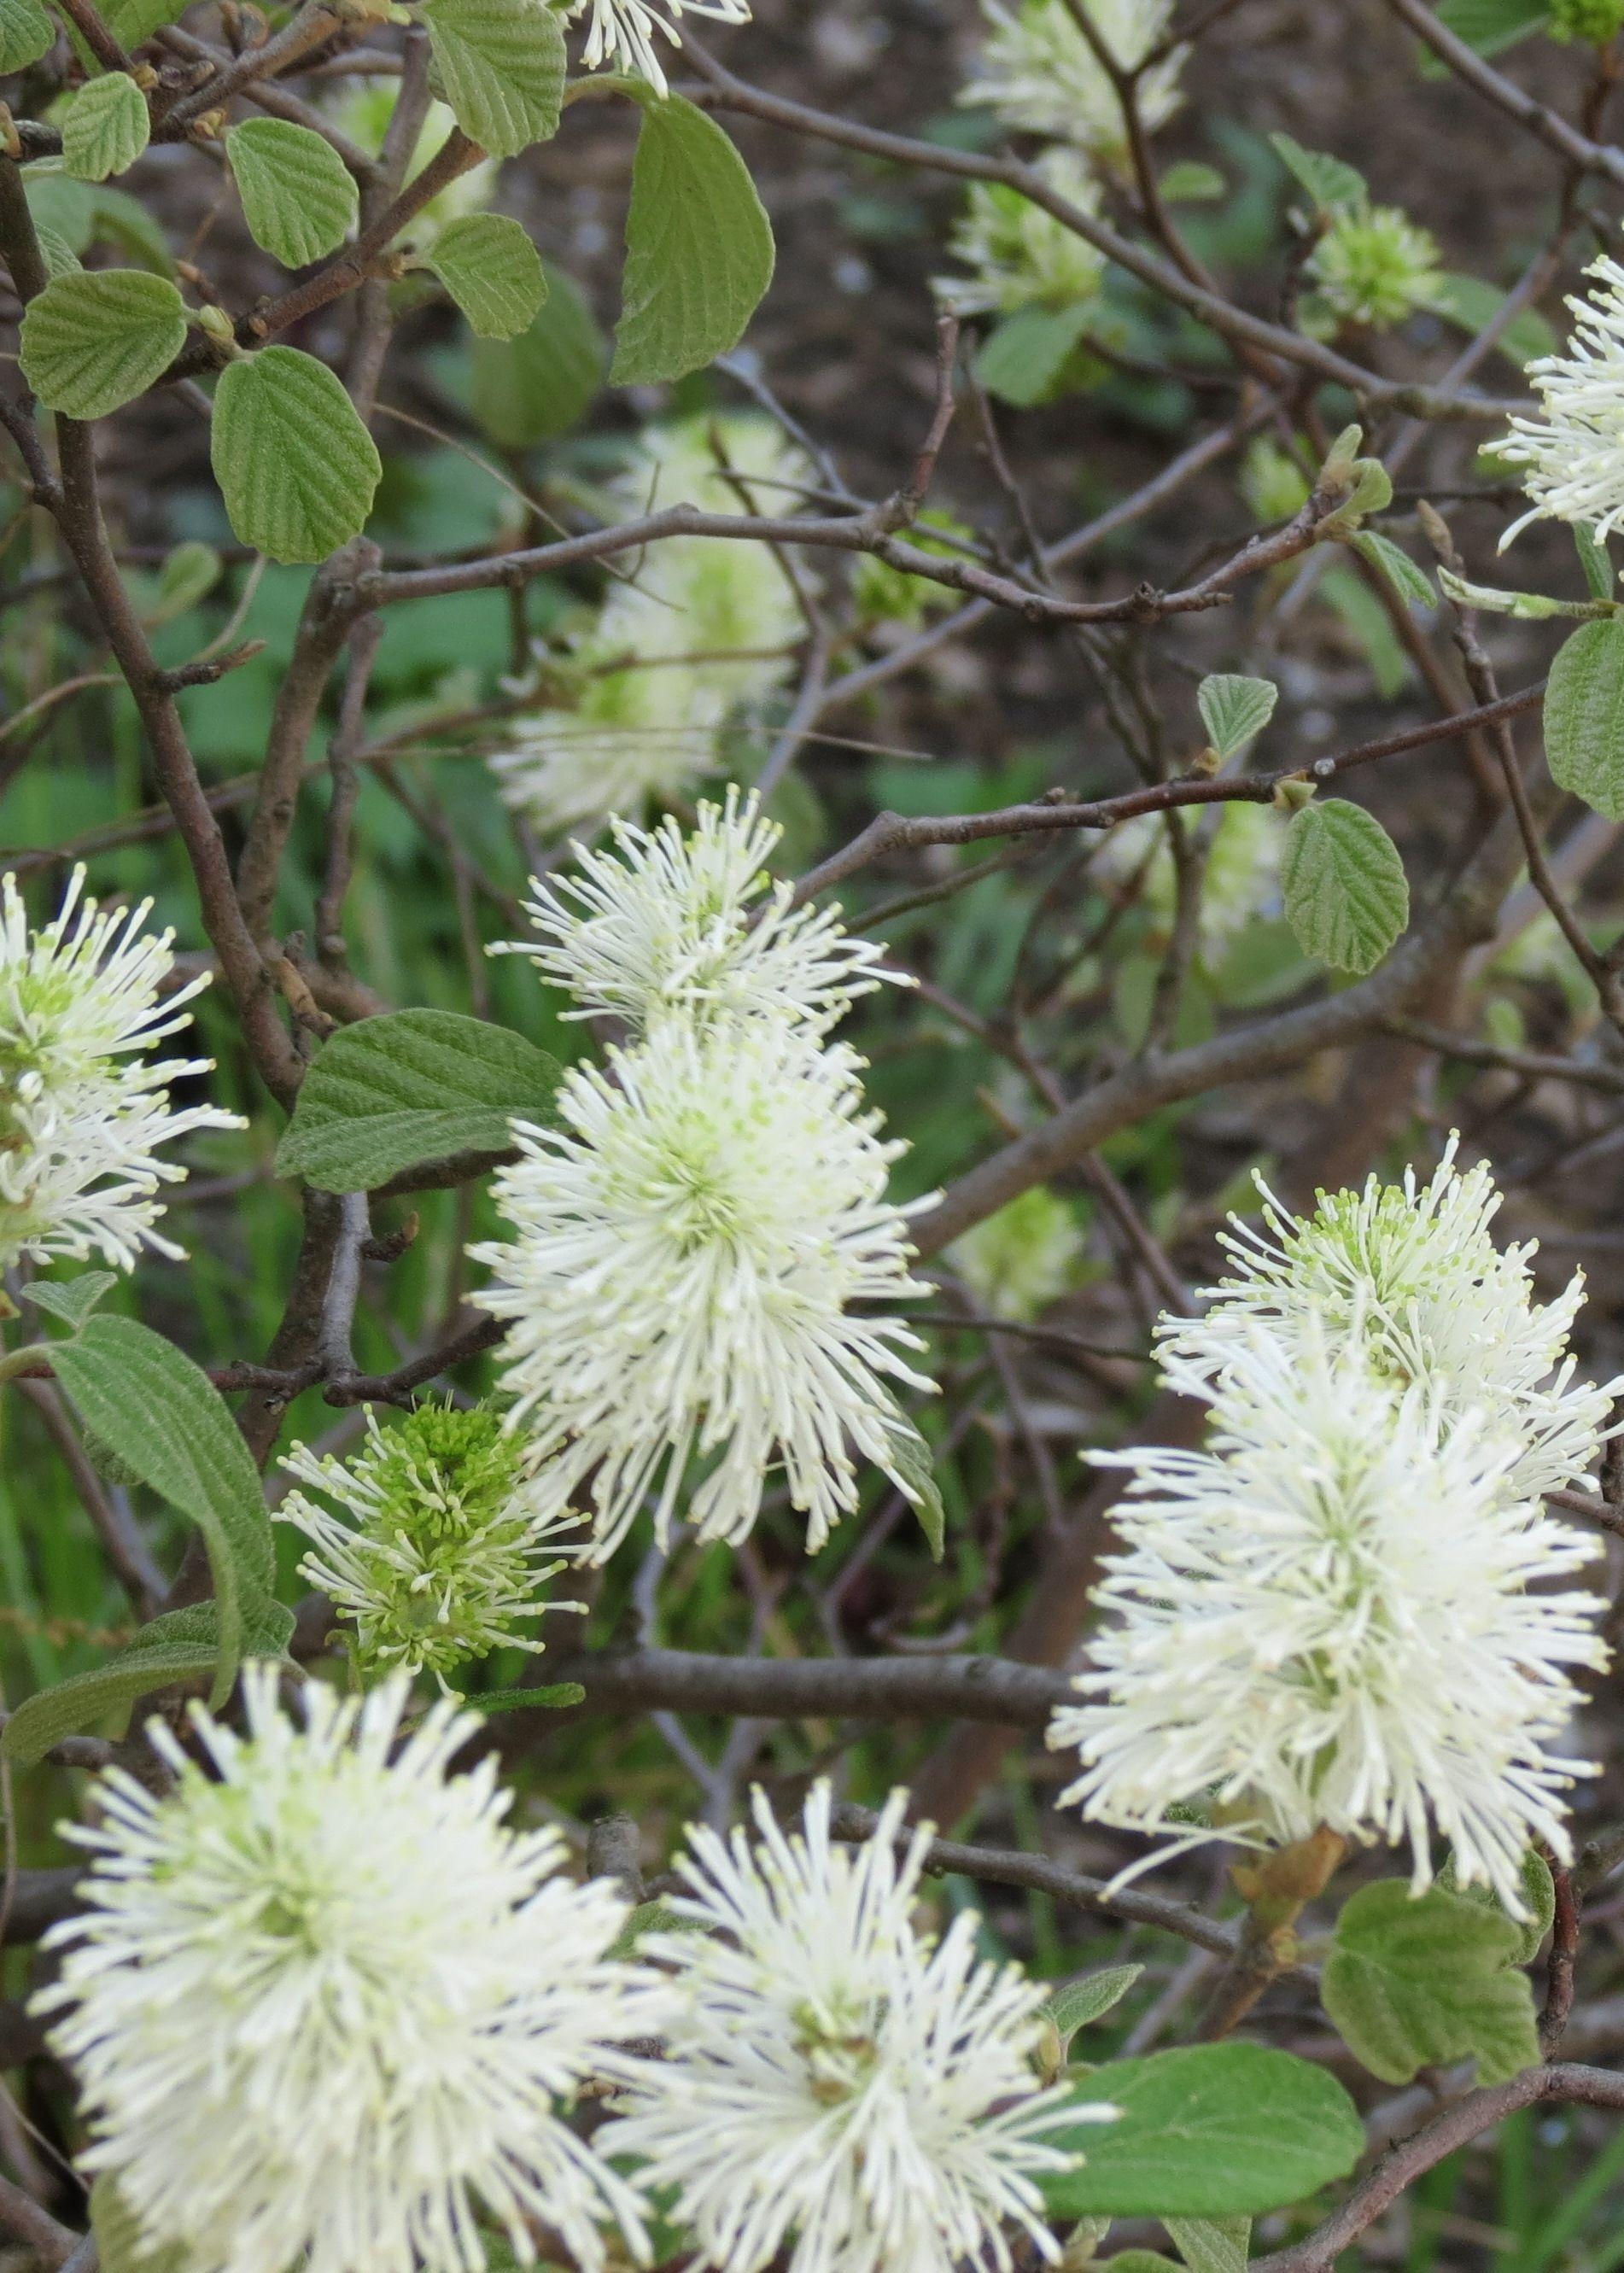 Native Medicinal Plants Part - 37: Wild Quinine, A Native American Medicinal Plant Growing Throughout North  Carolina.